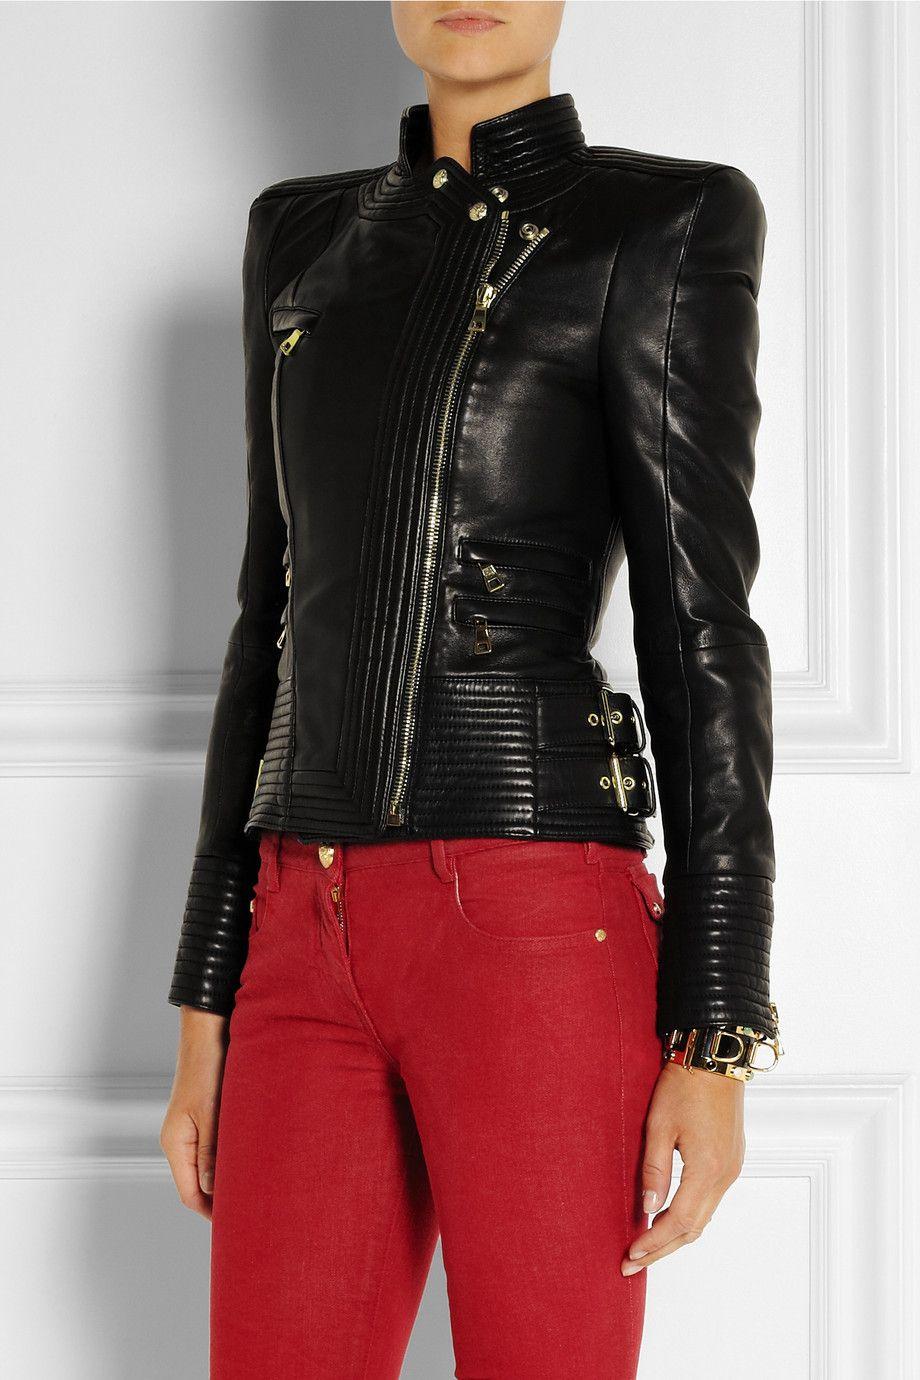 fcceb8ac754 Balmain   Leather biker jacket   NET-A-PORTER.COM   NETAPORTER ...